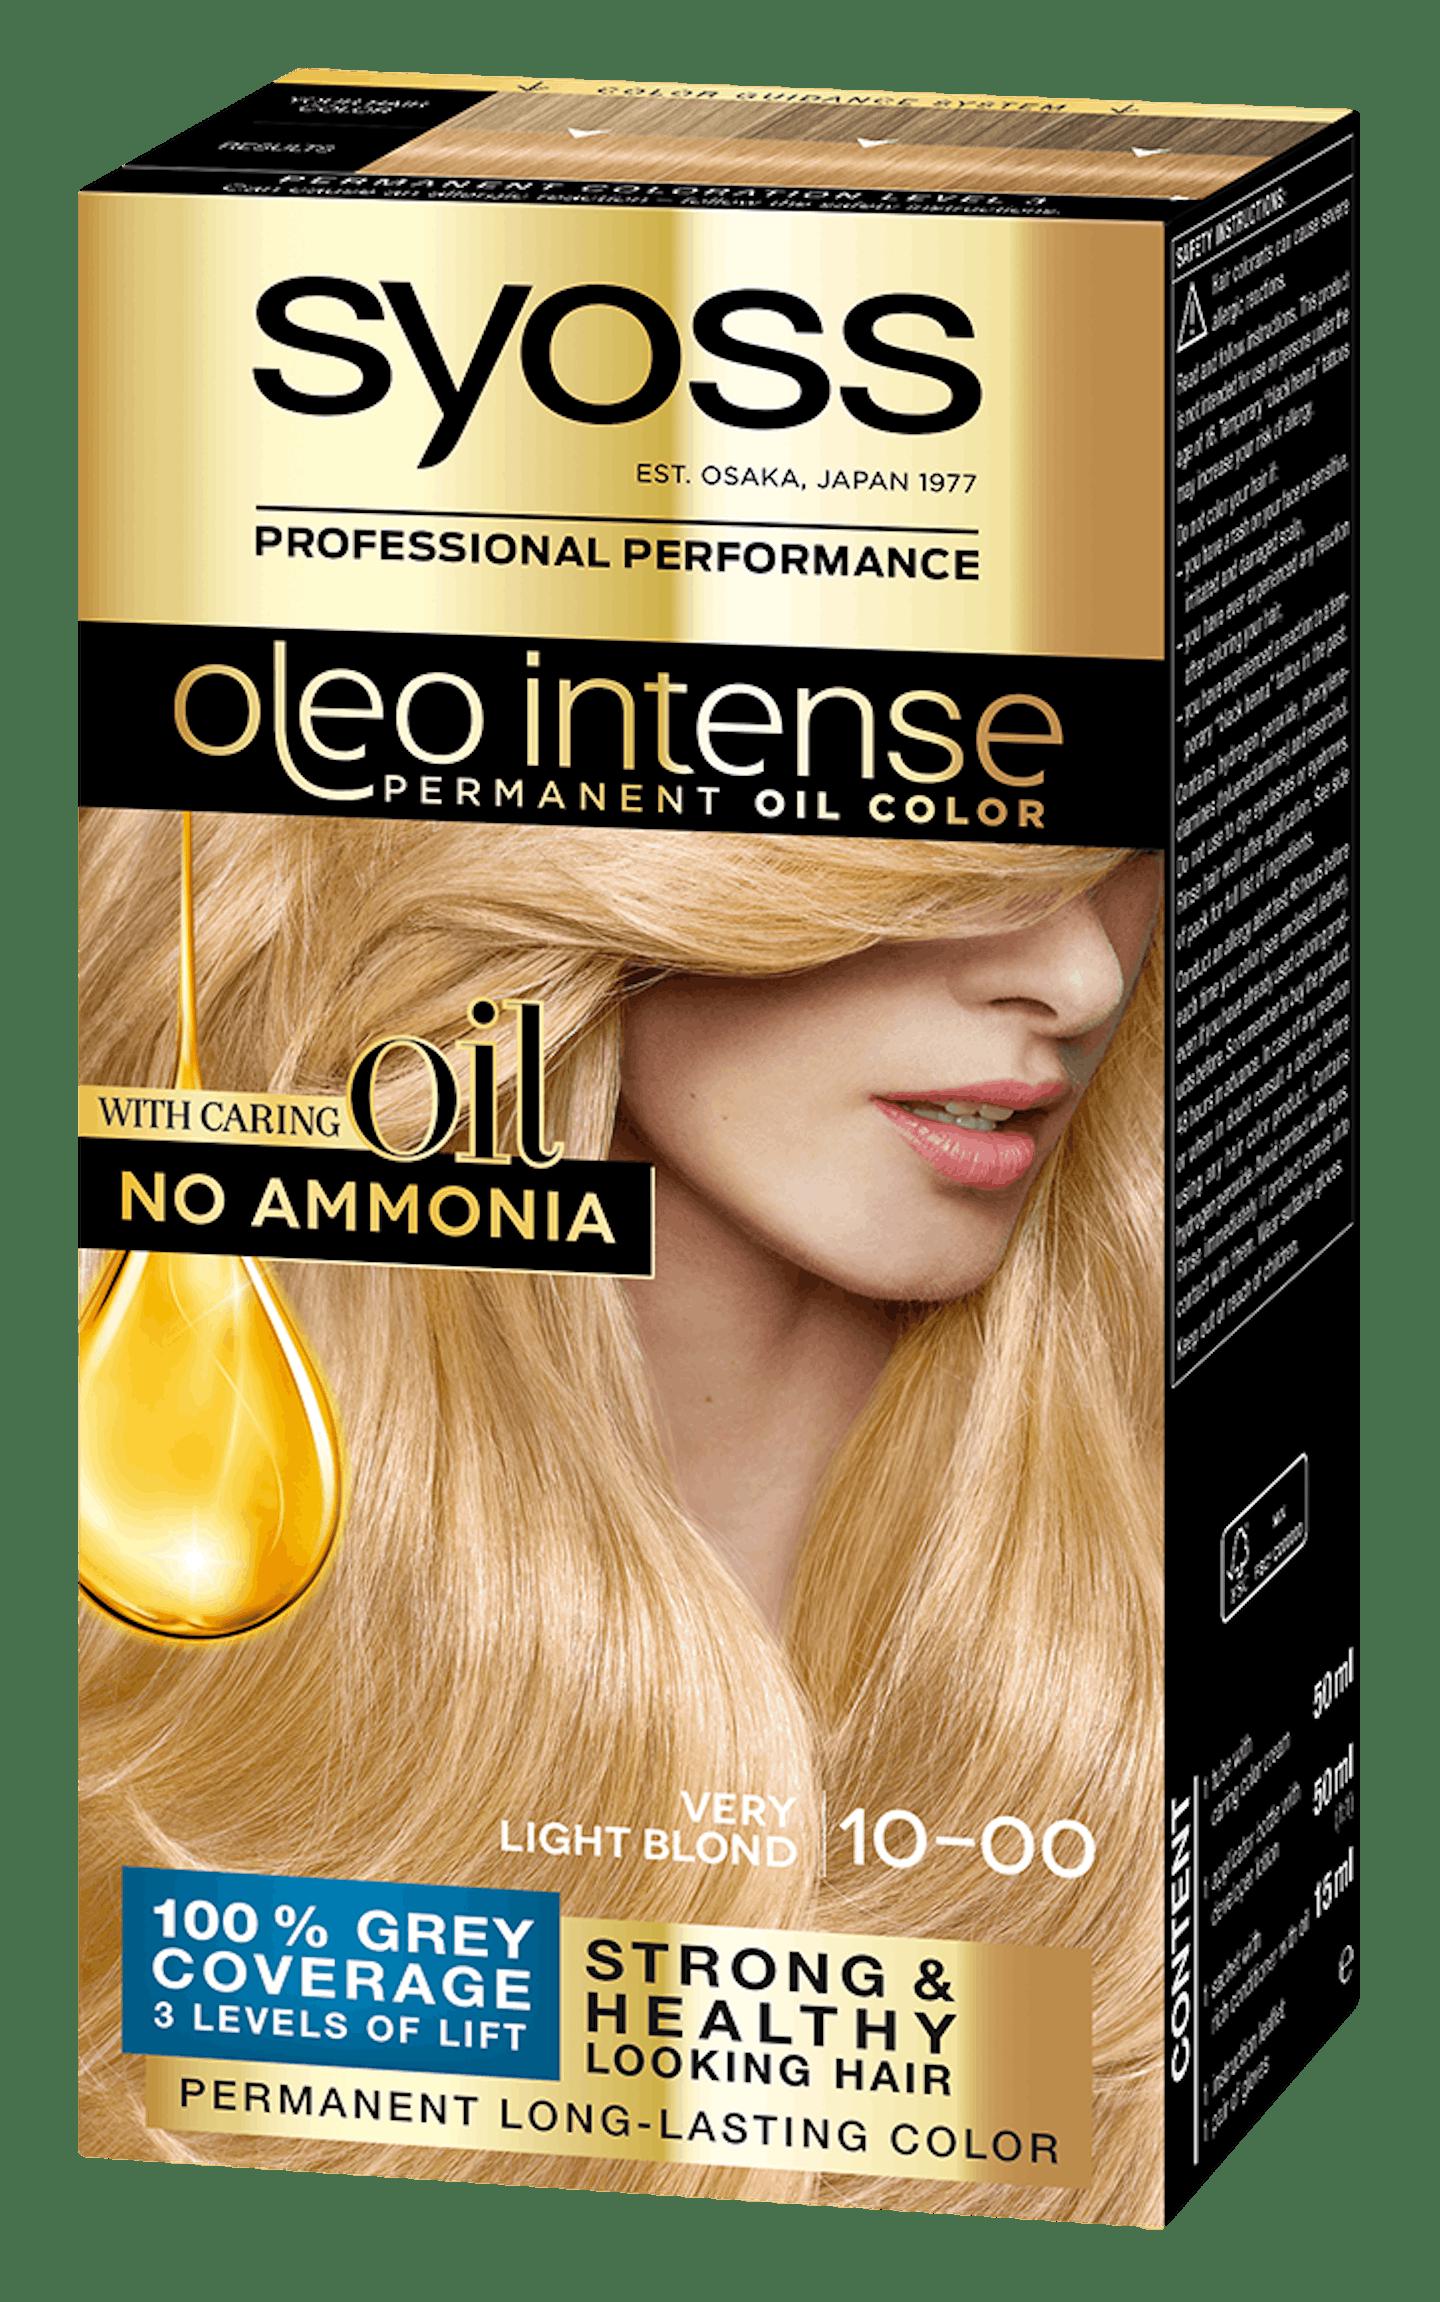 Very Light Blond 10-00